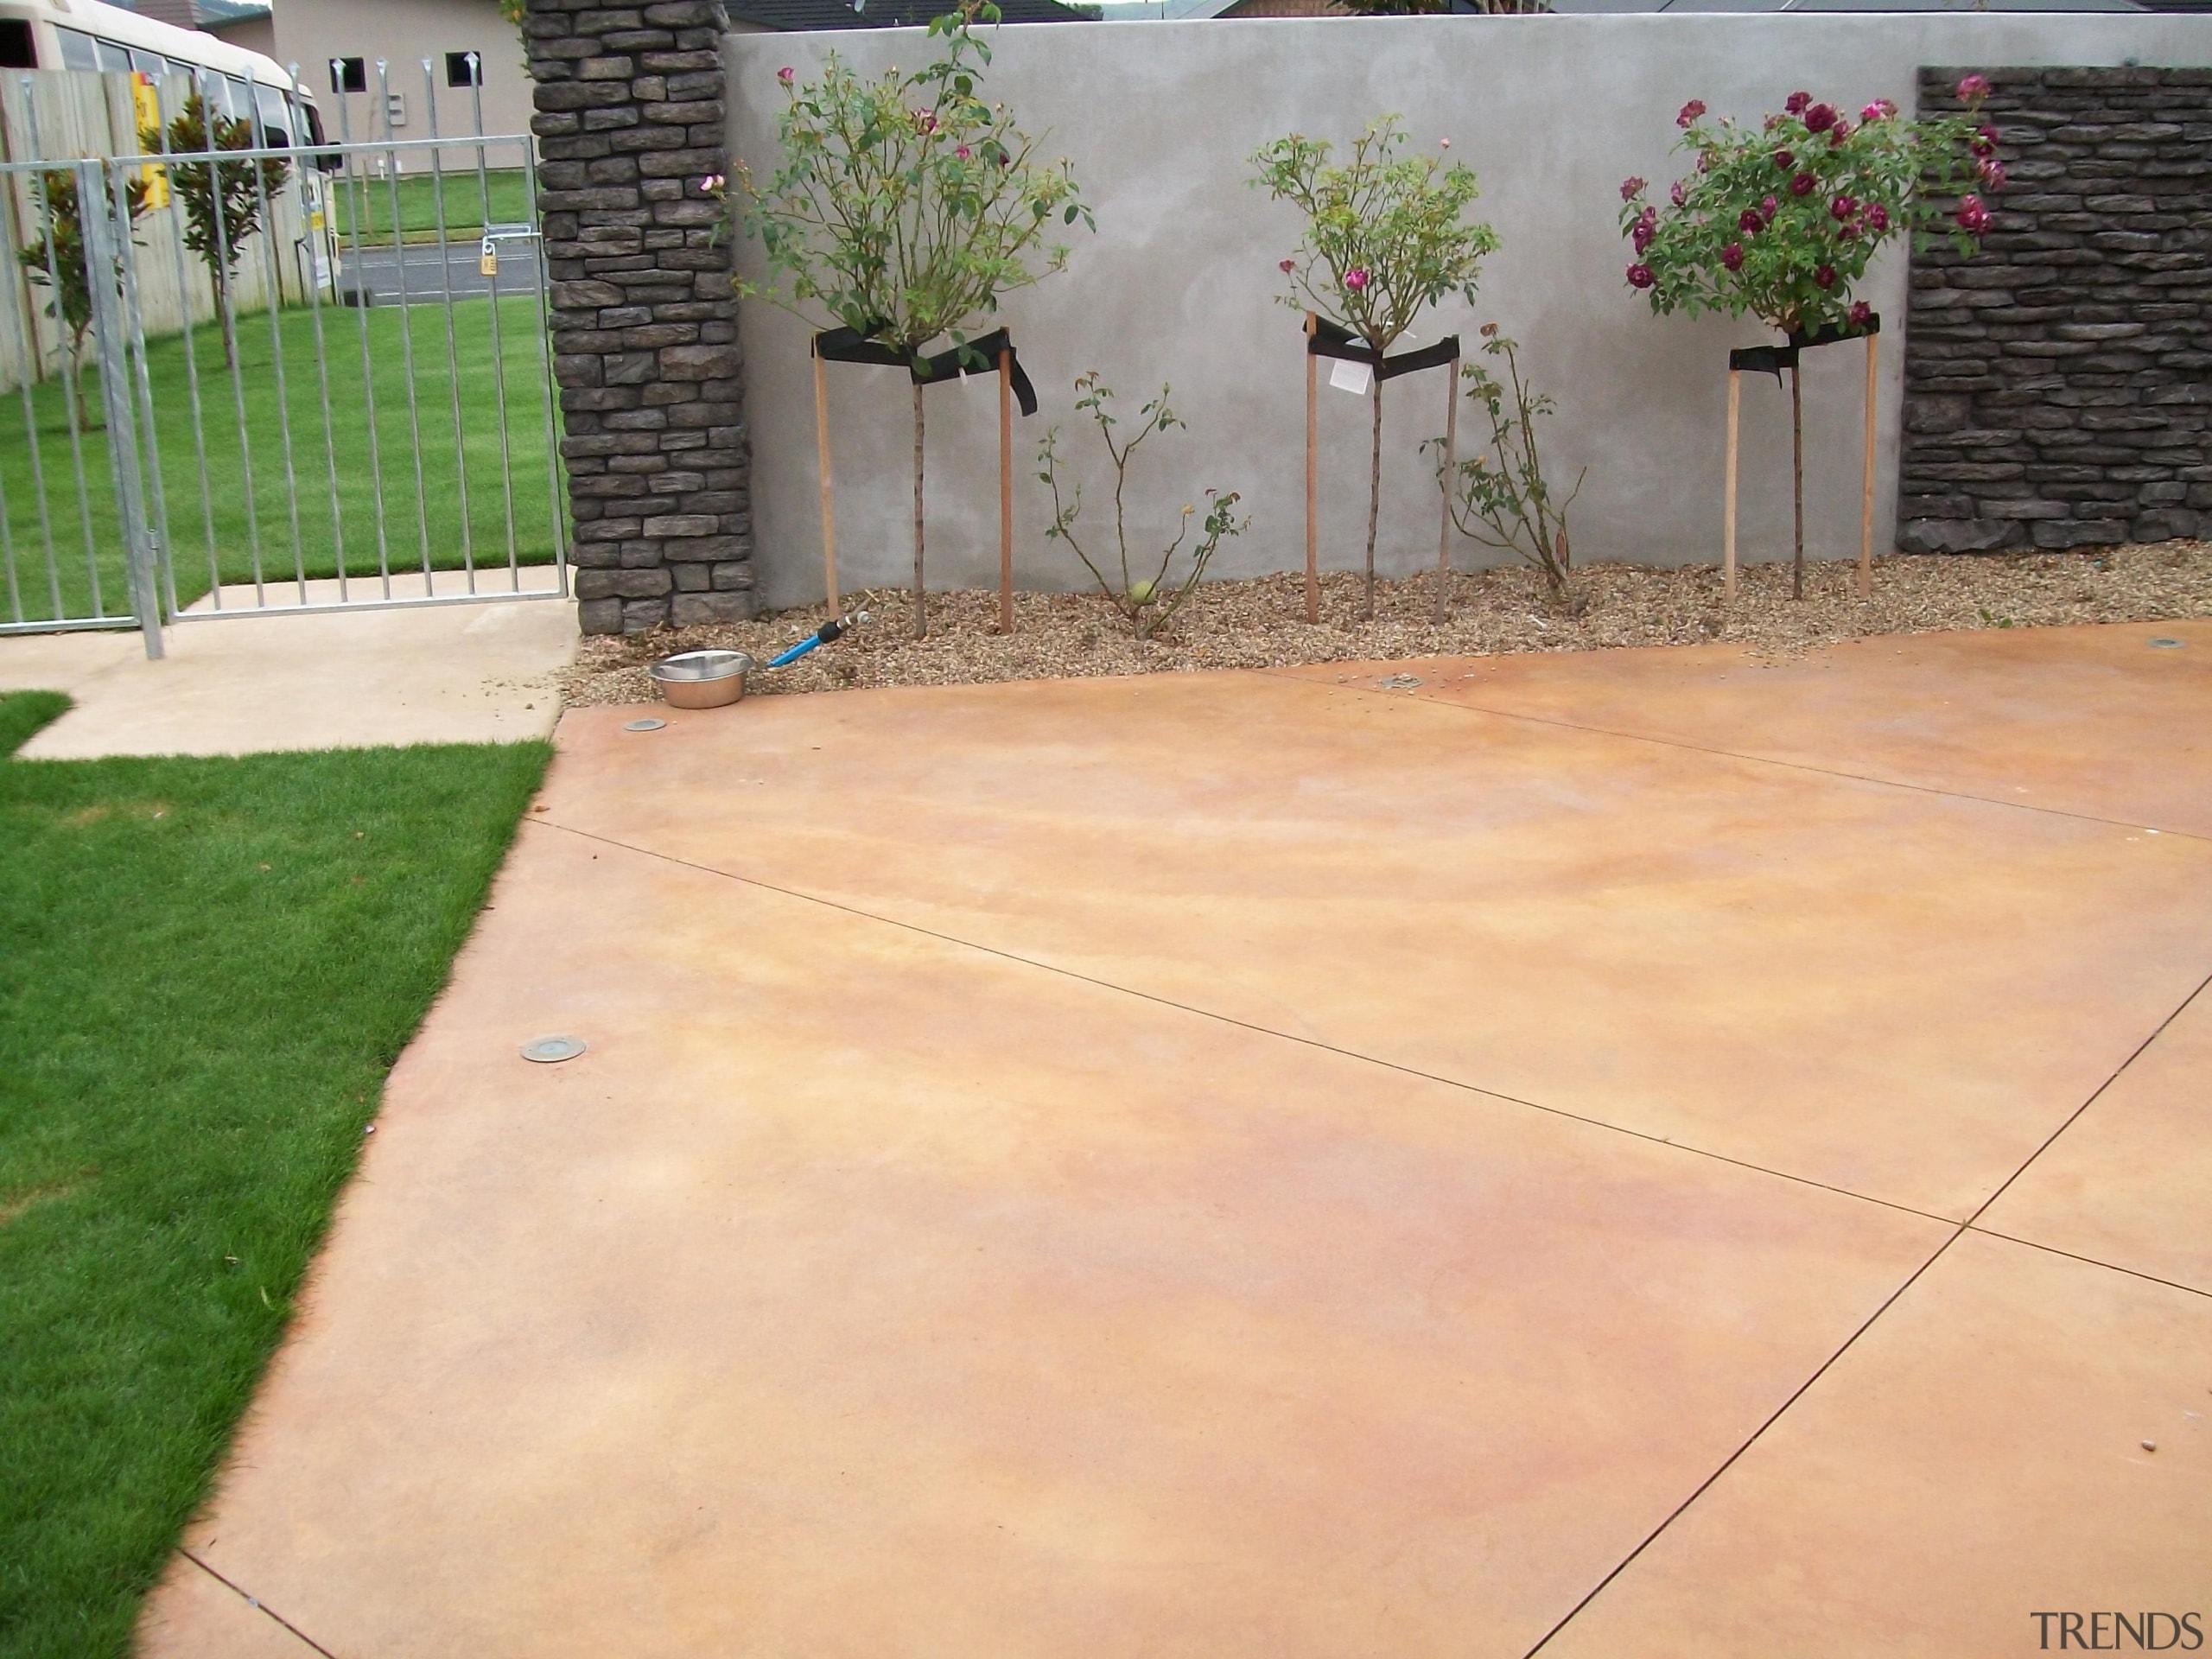 Colourmix 25 - Colourmix_25 - backyard   concrete backyard, concrete, driveway, floor, grass, outdoor structure, property, road surface, walkway, yard, orange